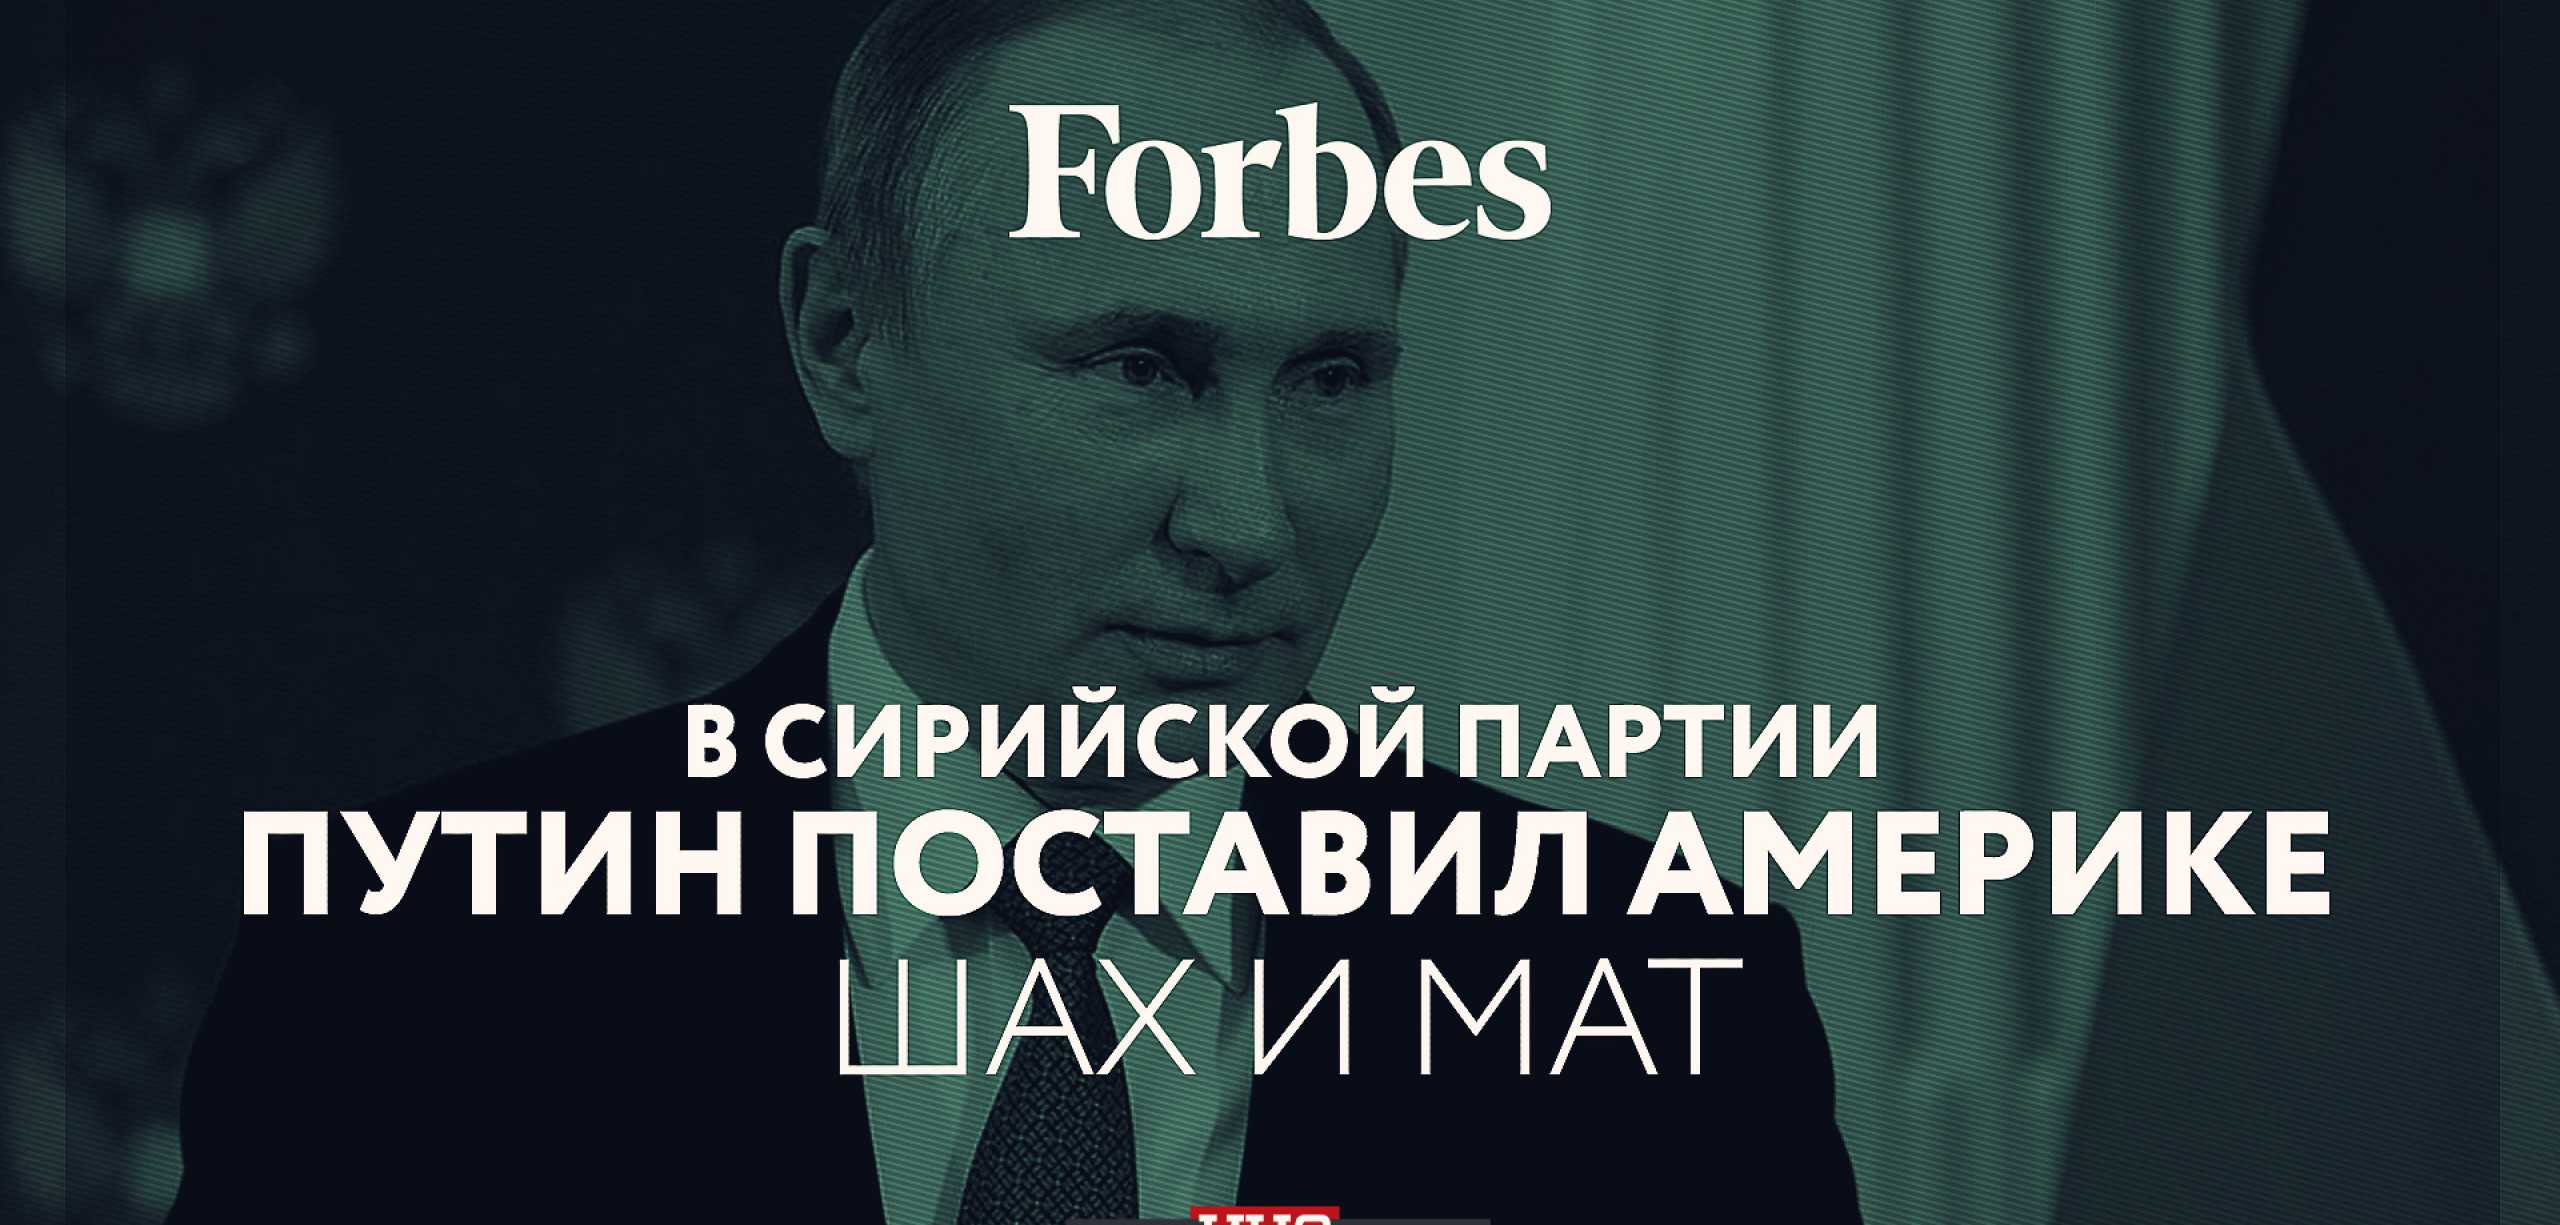 """Forbes"": в сирийской партии Путин поставил Америке шах и мат"